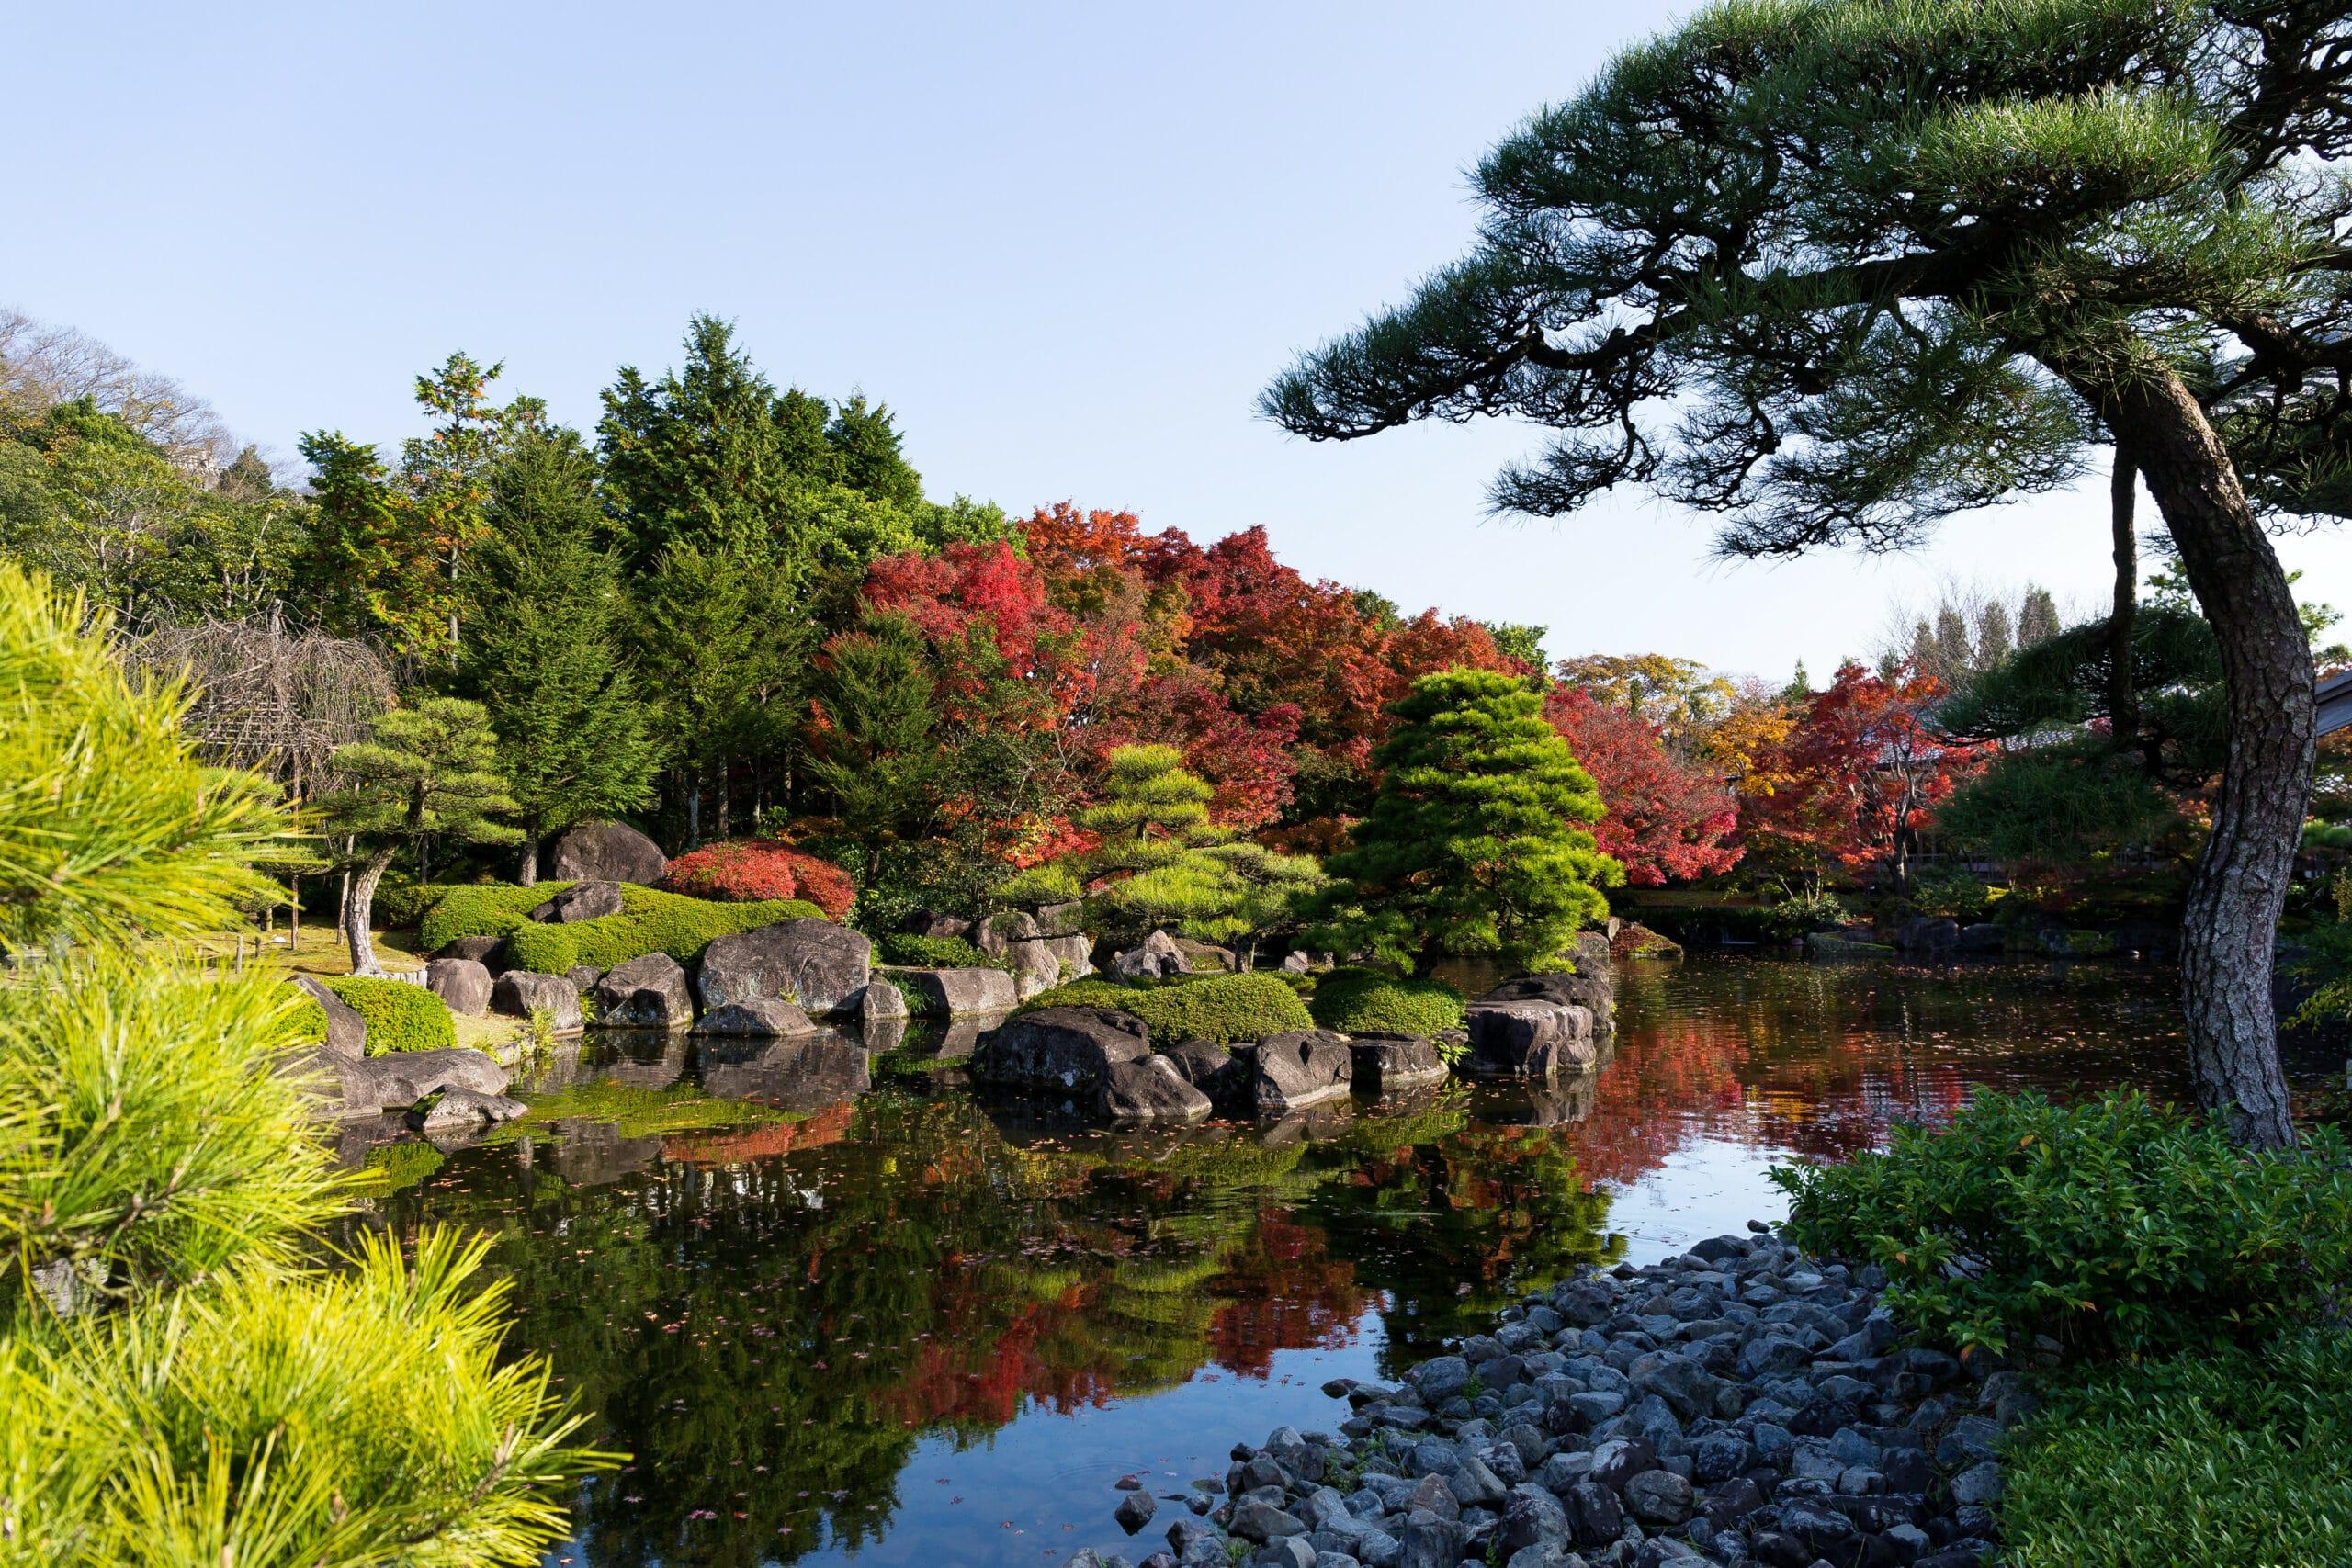 Japanese garden with autumn